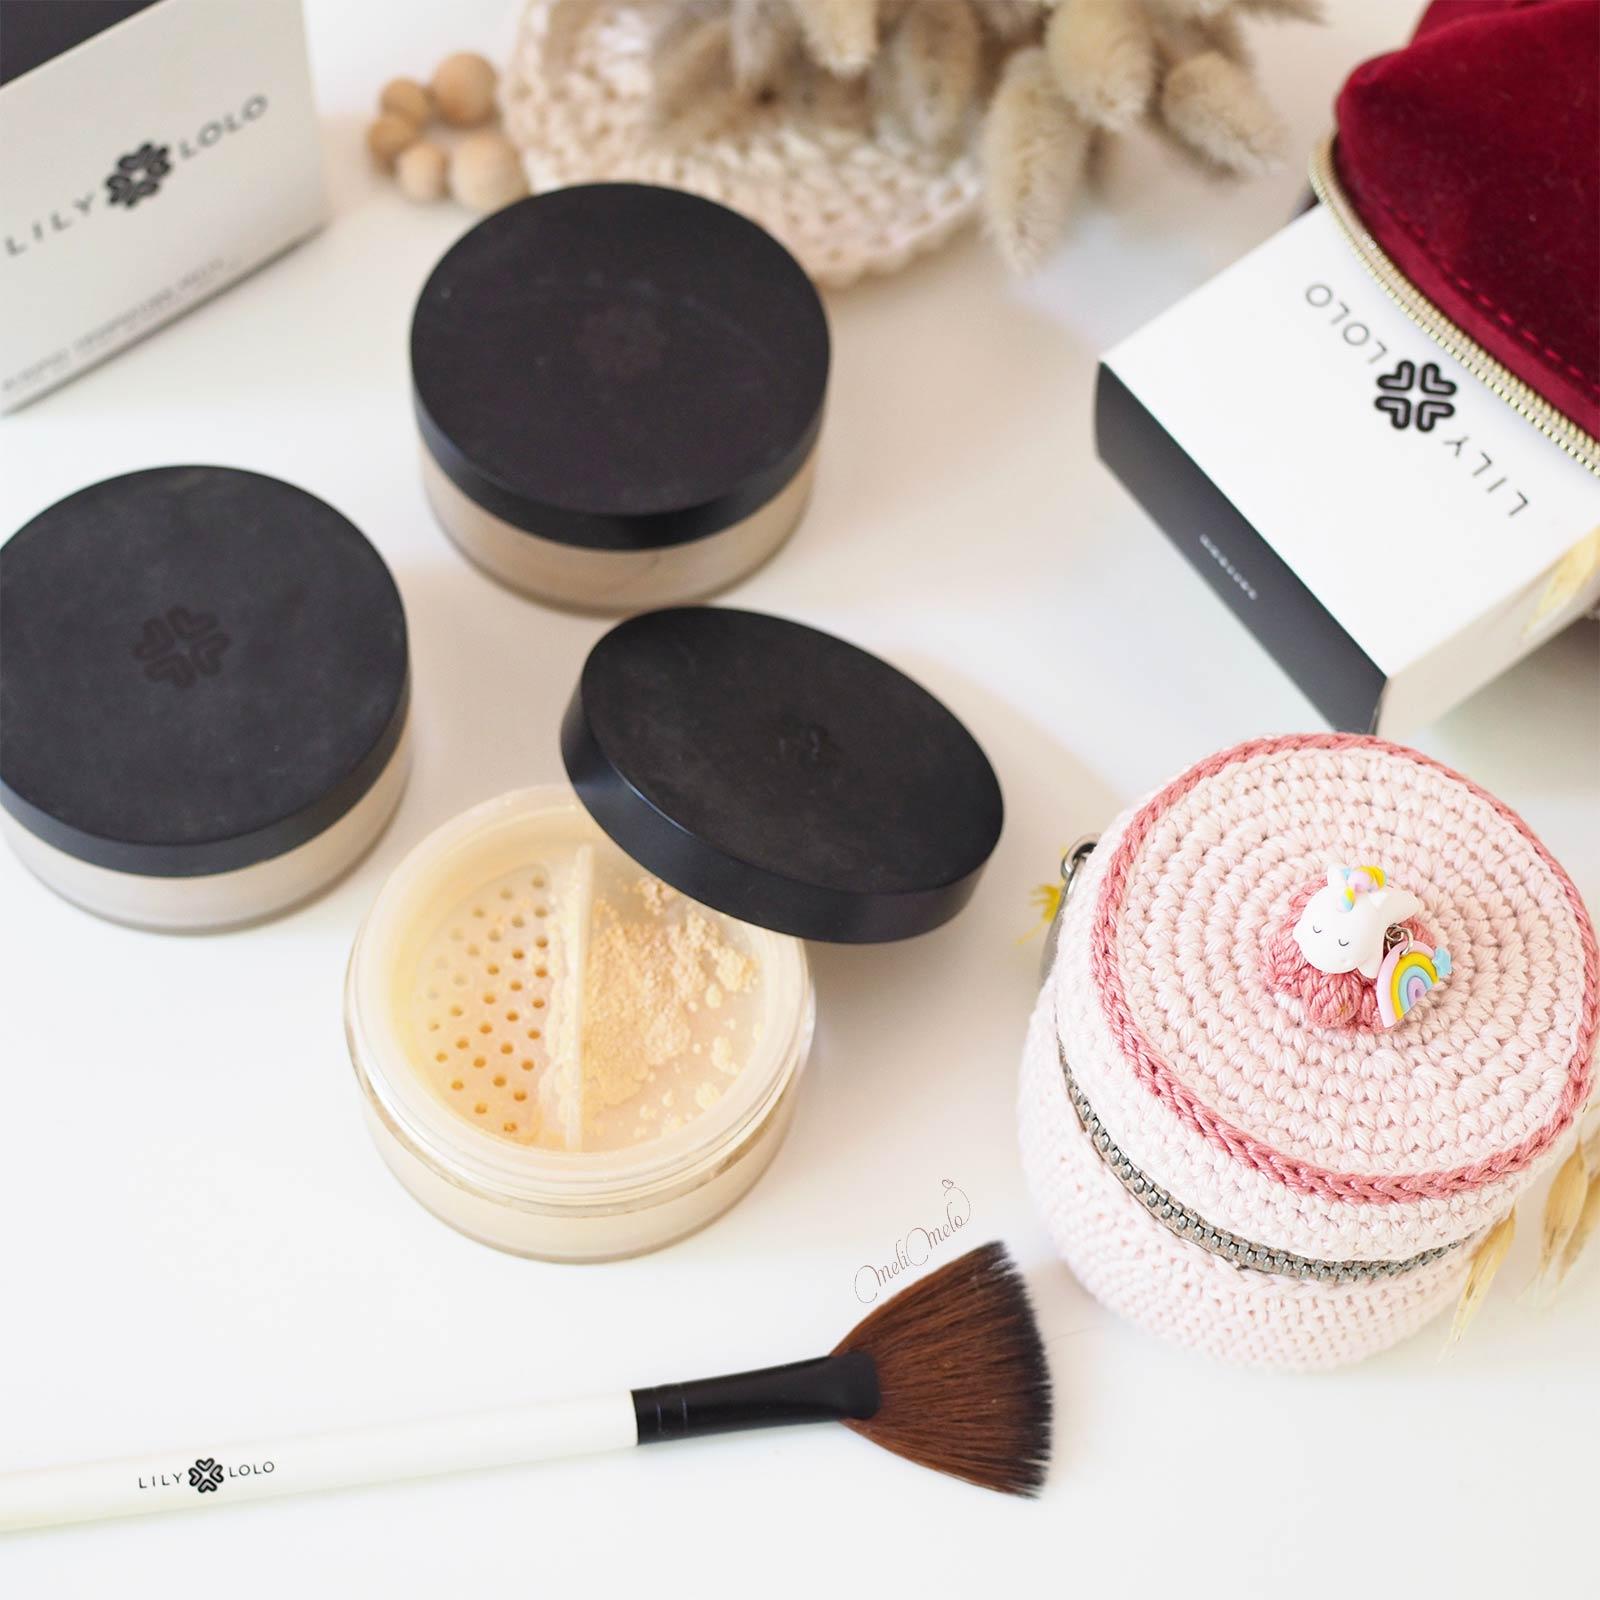 boite-maquillage-poudre-lily-lolo-crochet-coton-laboutiquedemelimelo